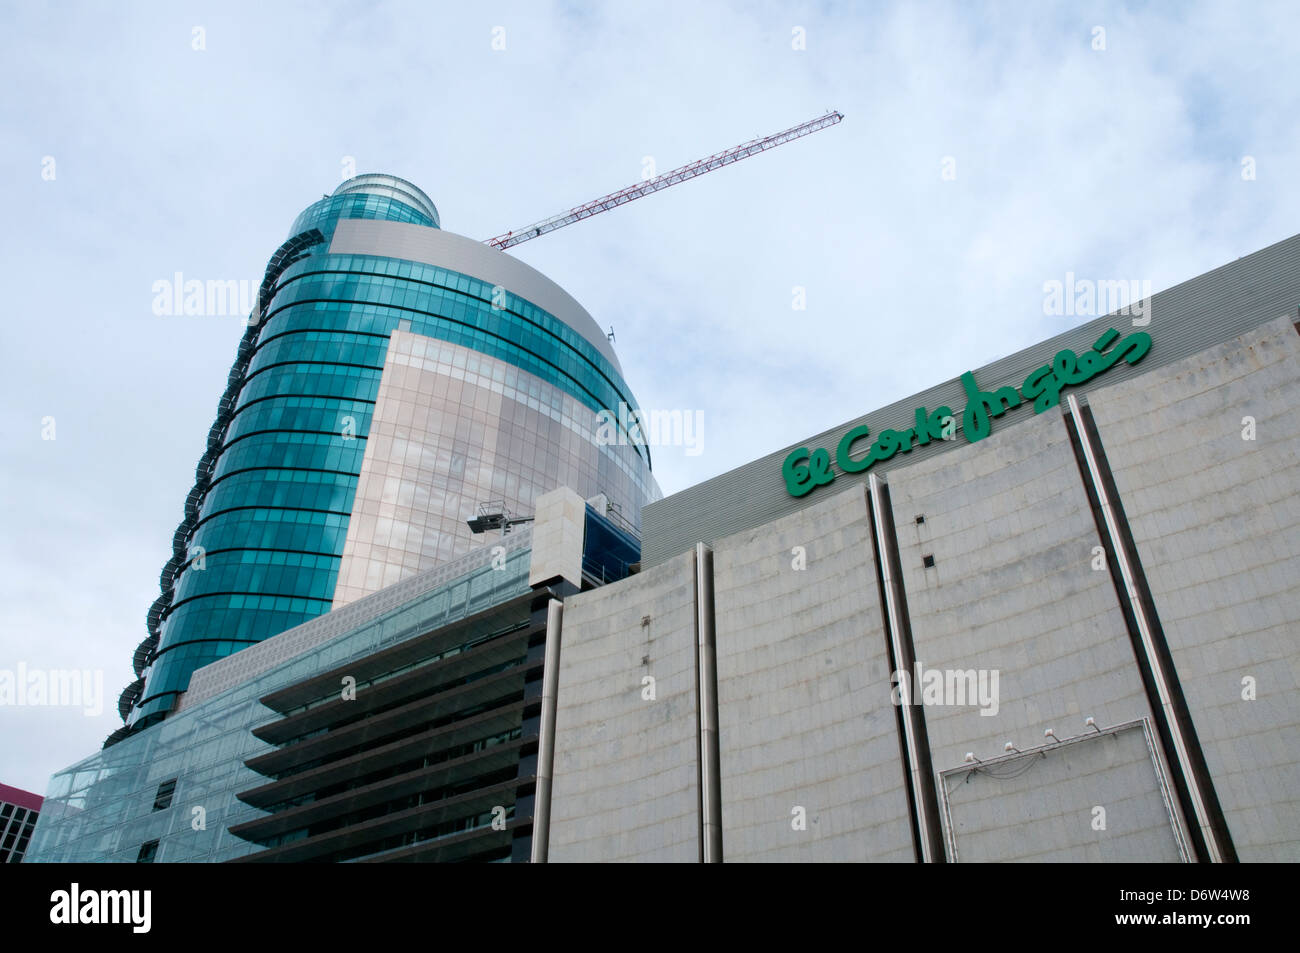 Titania Tower, El Corte Ingles. AZCA, Madrid, Spain. - Stock Image